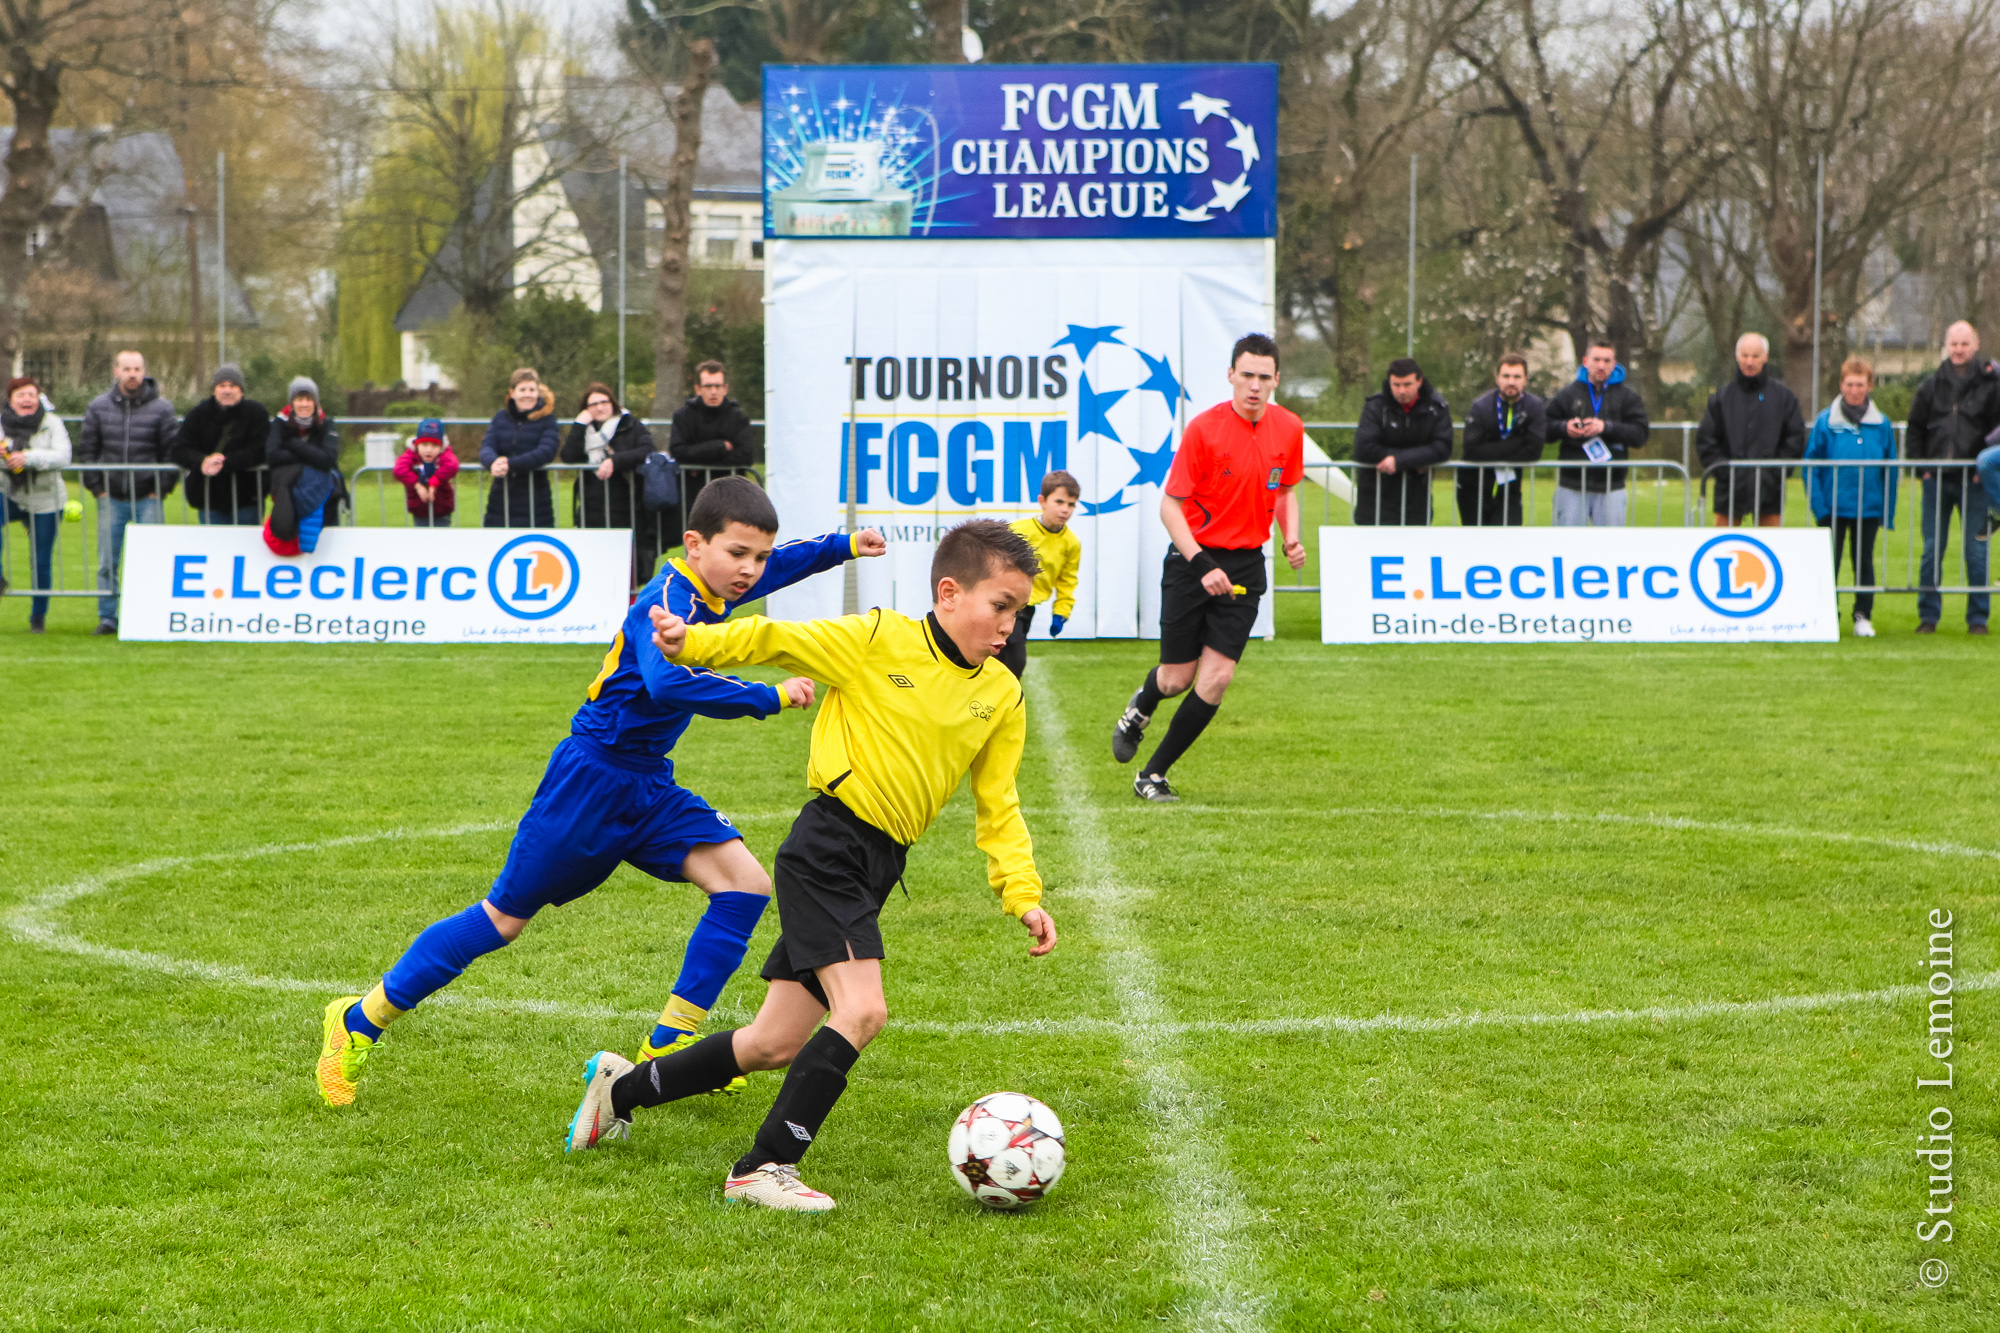 Studio_Lemoine_Tournois_Football_FCGM_Messac_Guipry_Préliminaires_0014